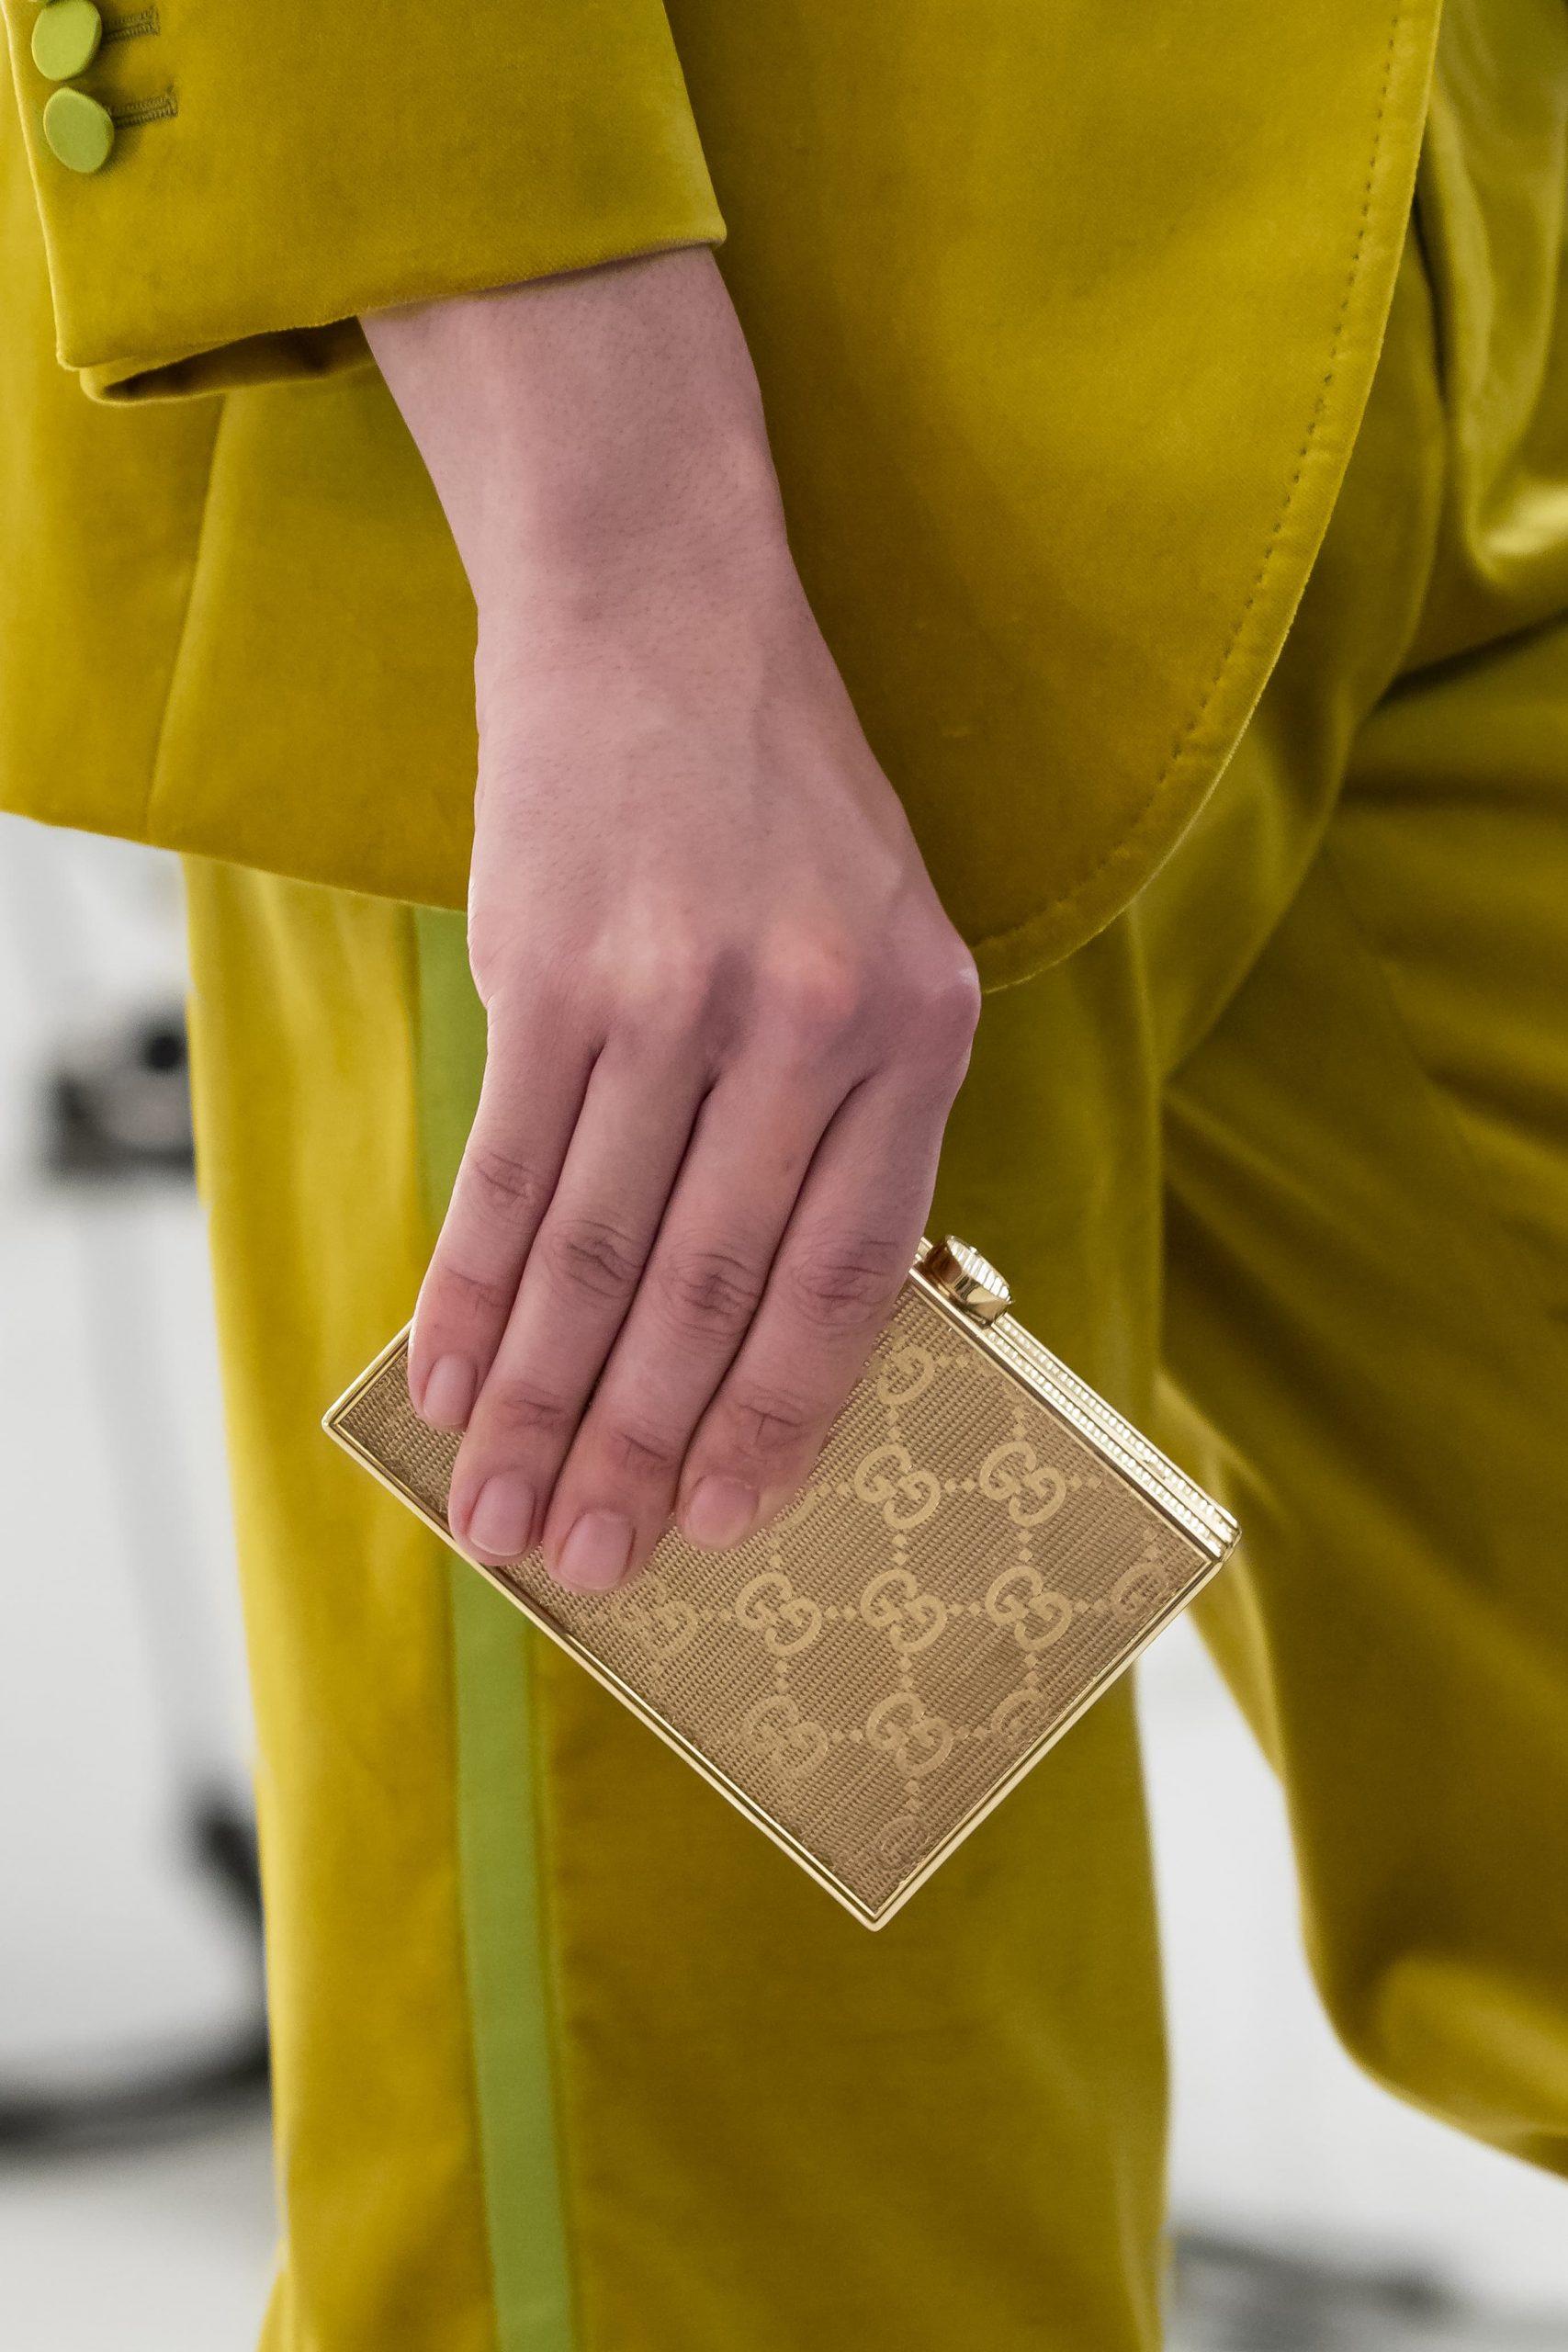 Gucci Fall 2021 Fashion Show Details